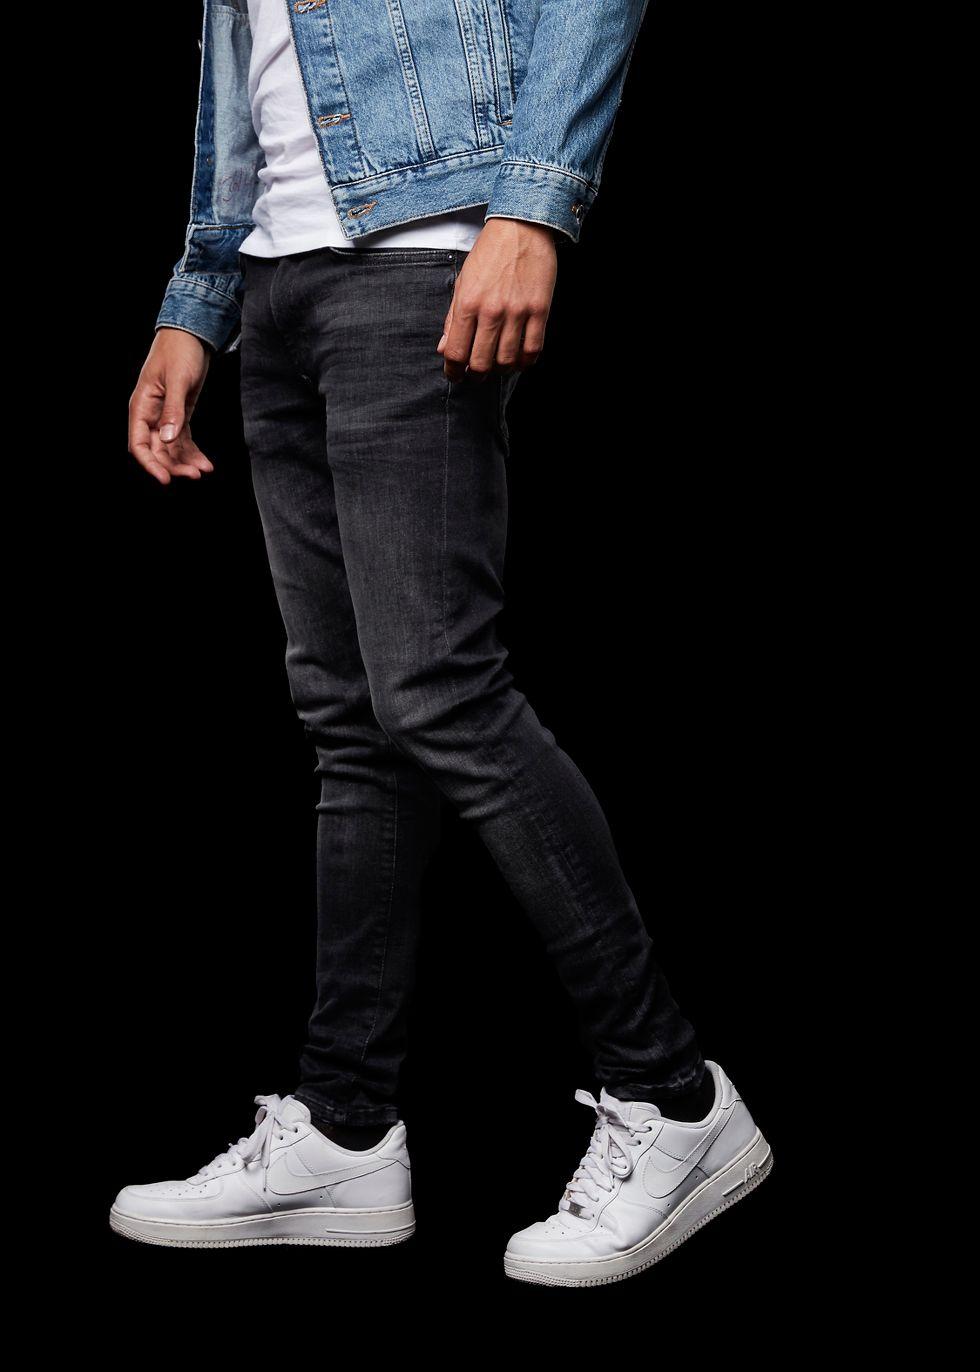 Ashes to dust jeans te koop van de Sting